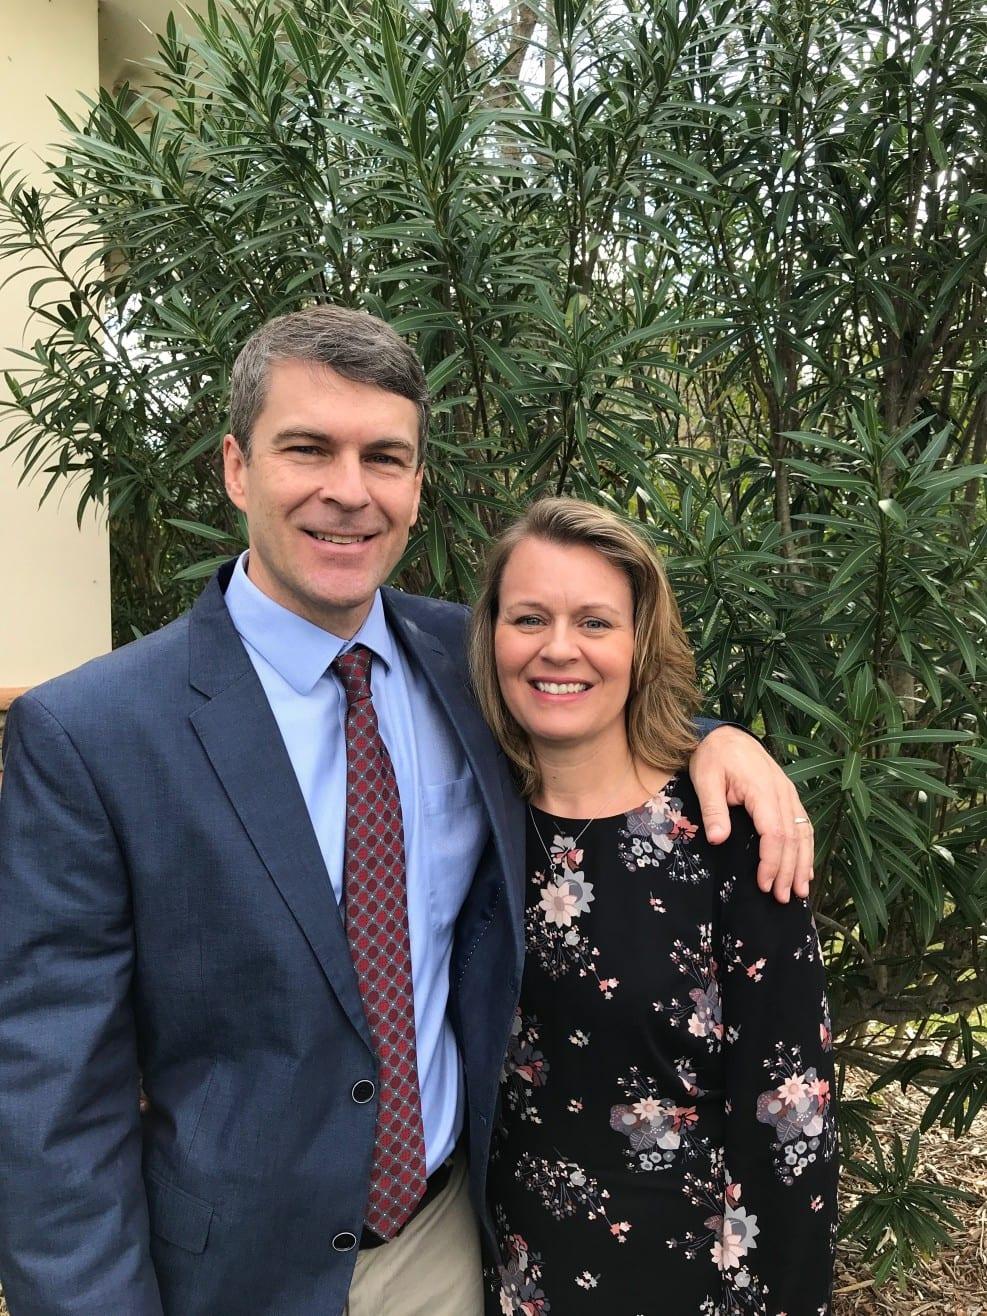 Karl and Julie Johnson, Managing Directors